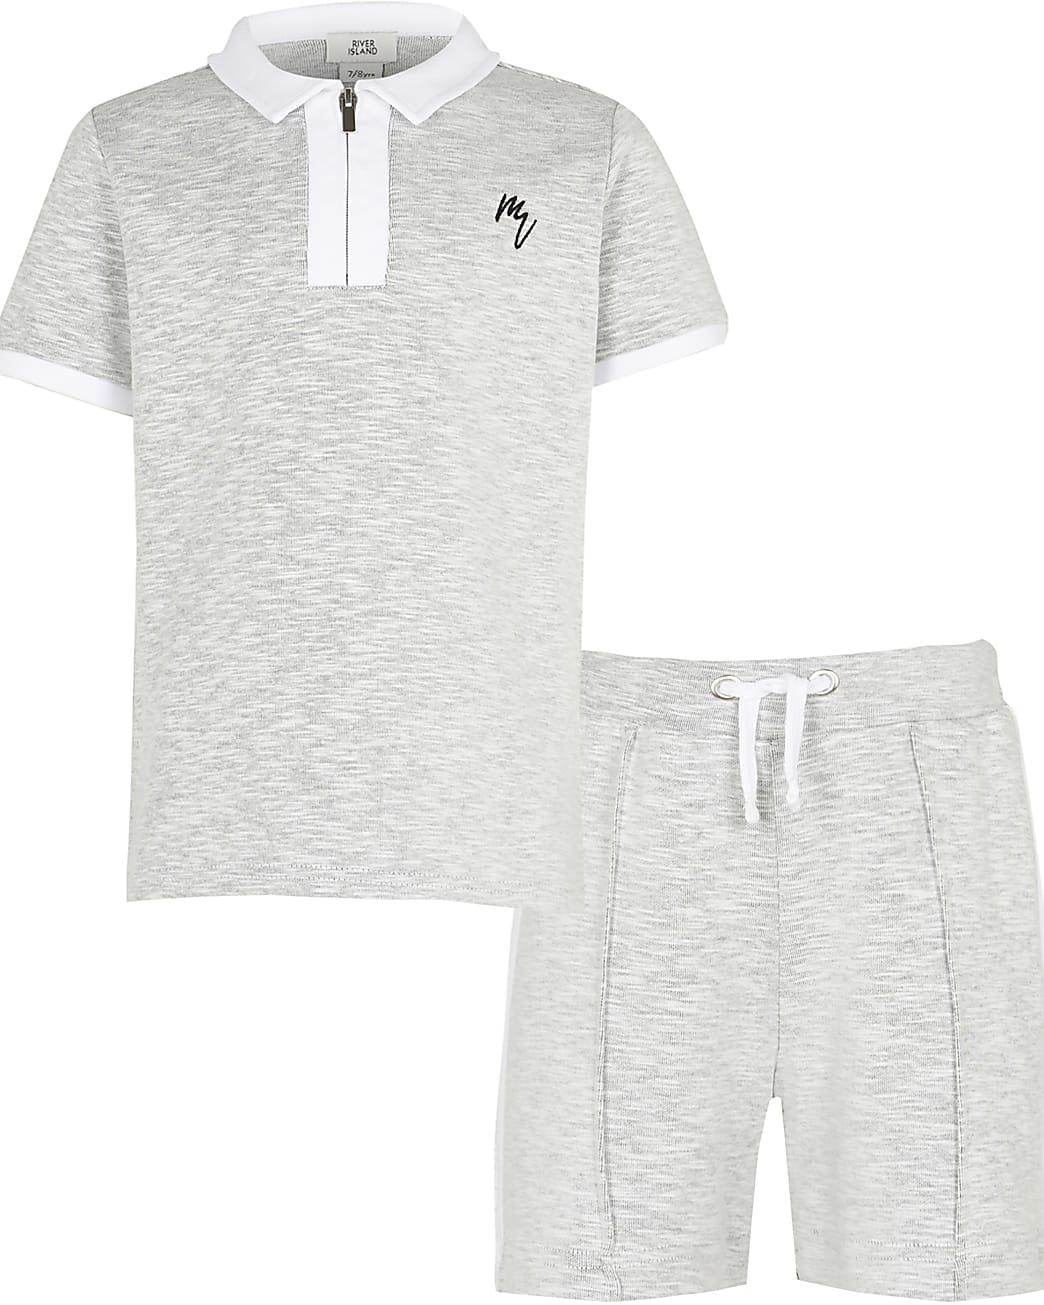 Maison Riviera boys grey polo shirt outfit